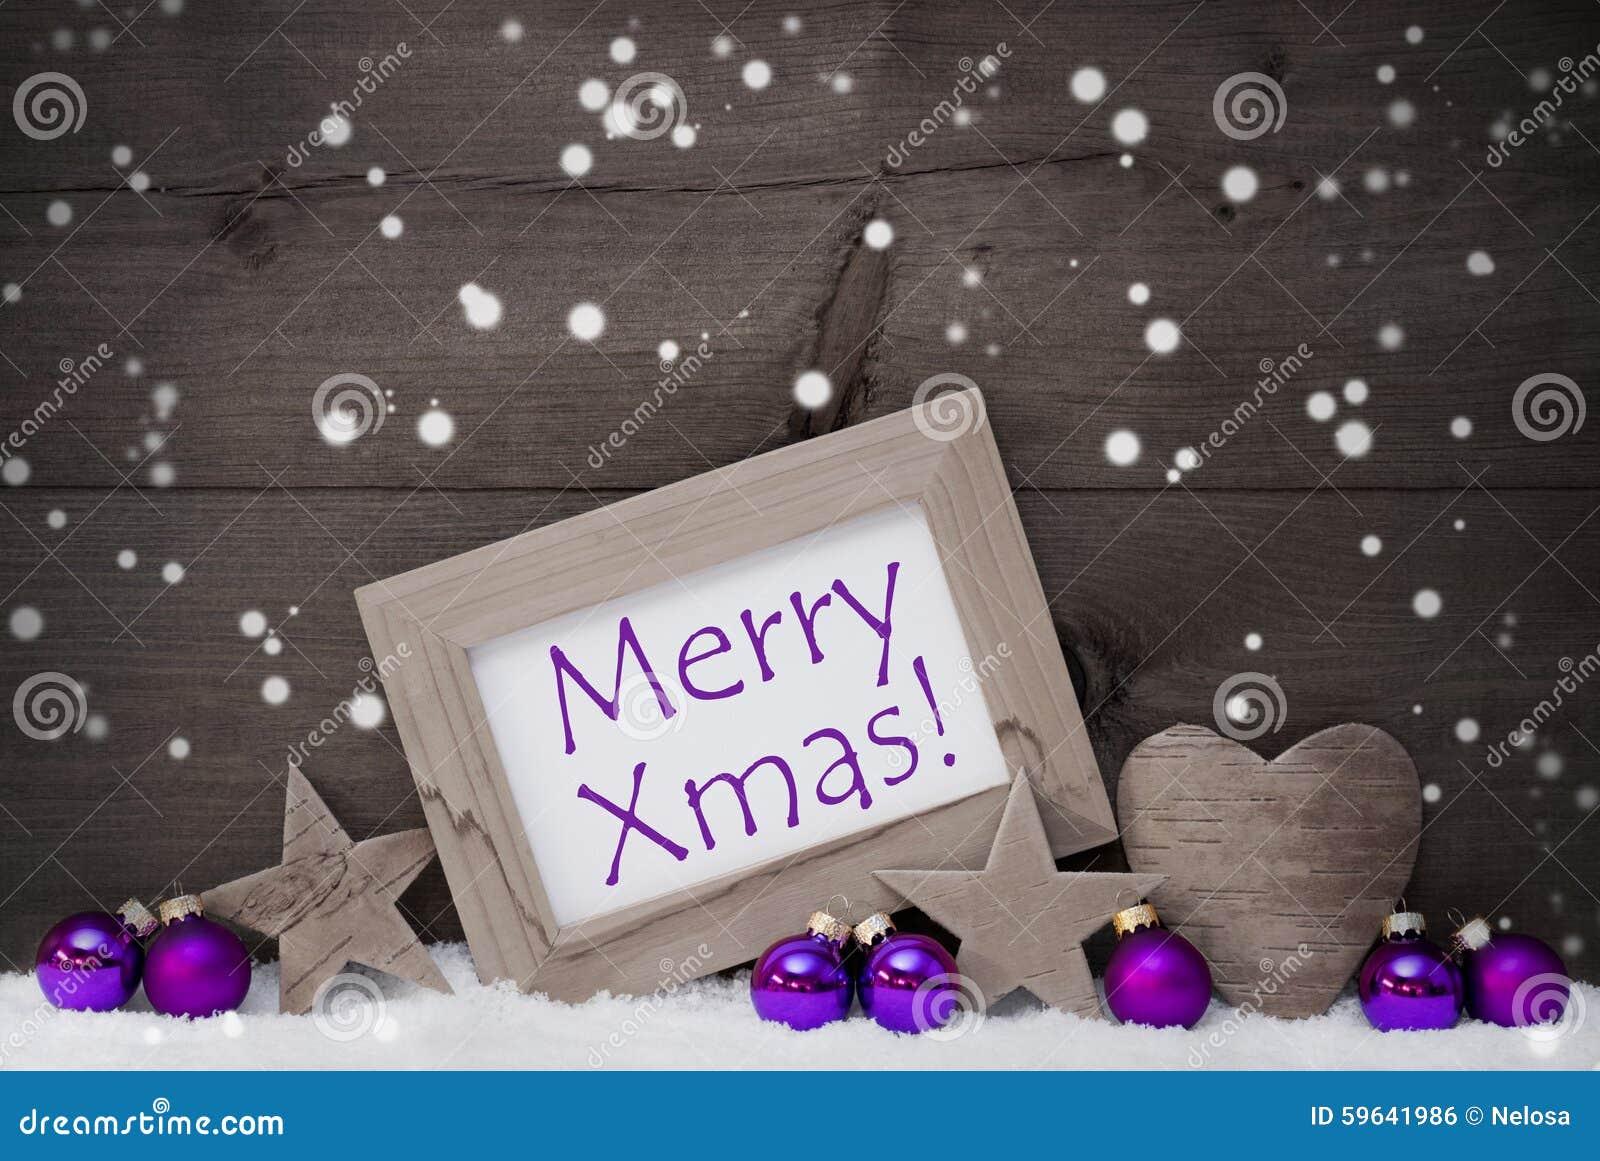 Gray Purple Christmas Decoration Text Merry Xmas, Snowflakes